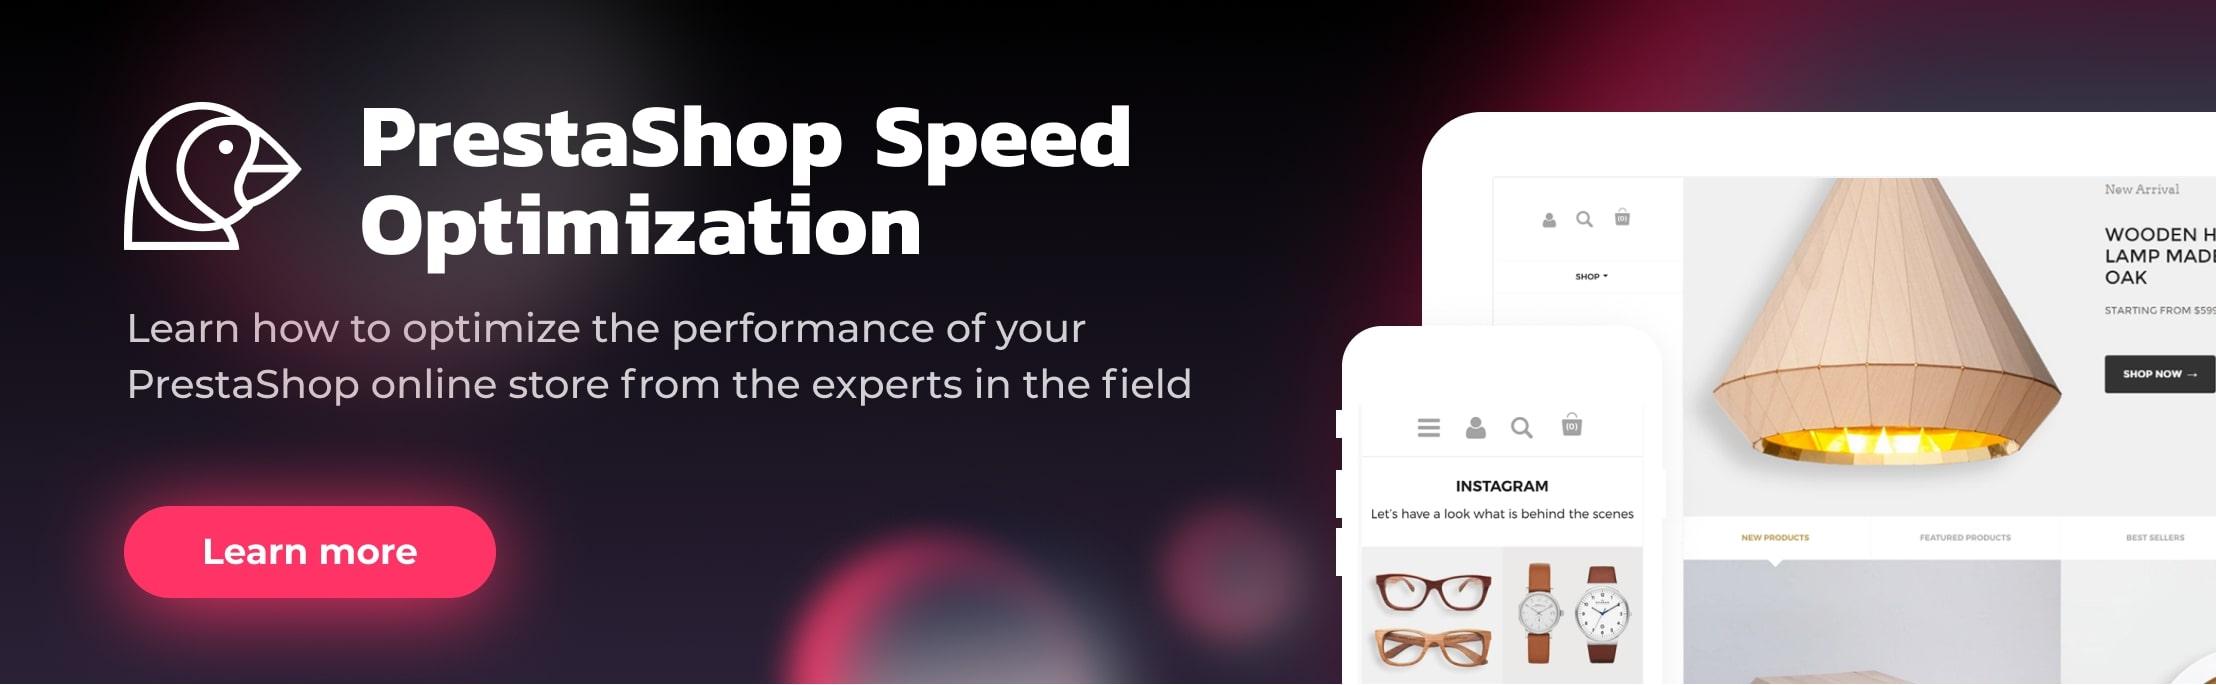 Prestashop Speed Optimization